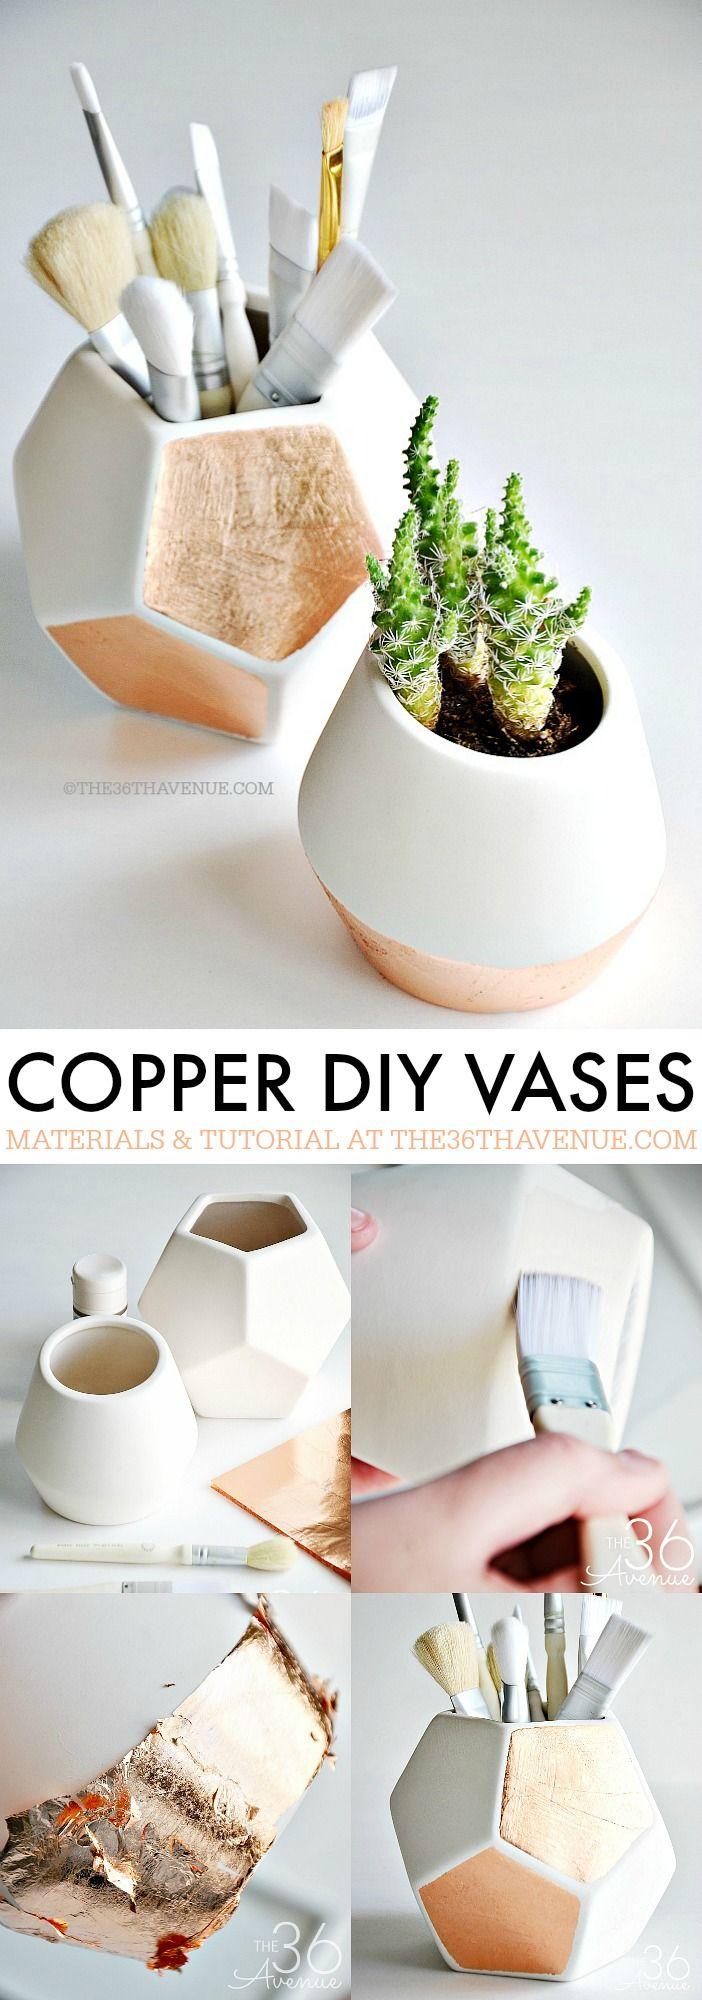 DIY Copper Vases - These DIY Copper Gold Leaf Storage Vases are adorable and super easy to make!